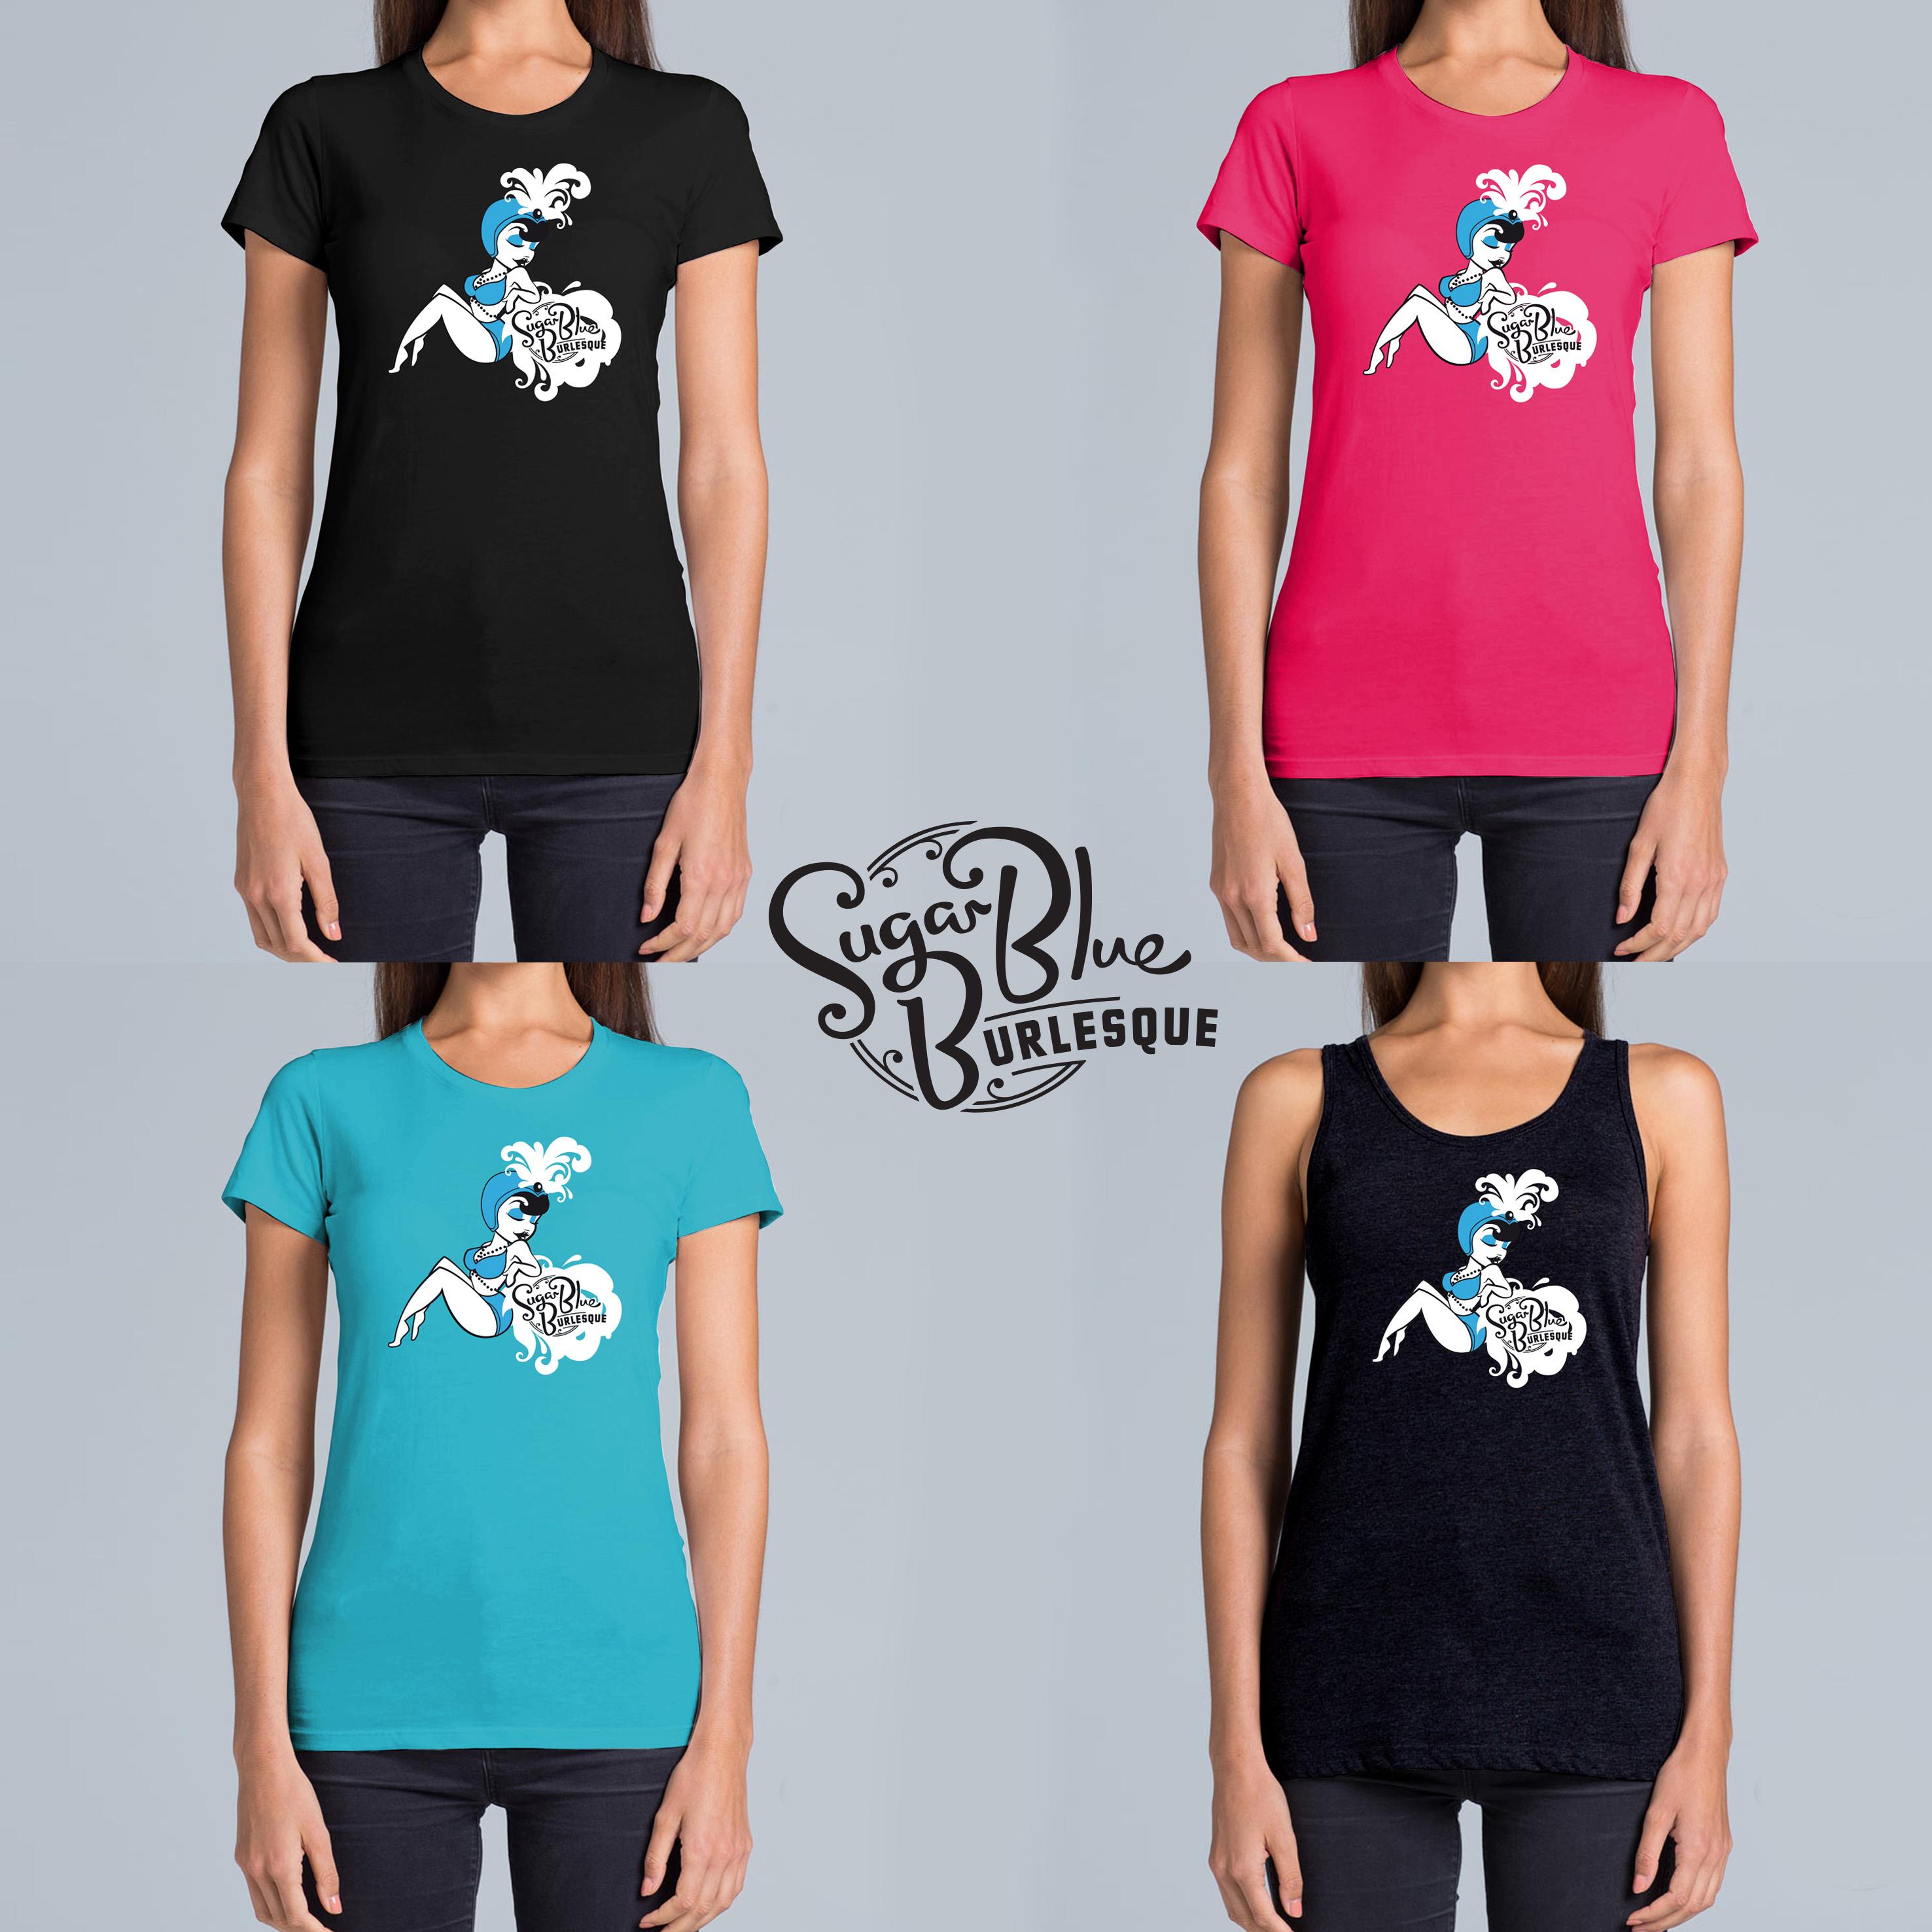 2014 t-shirt all four